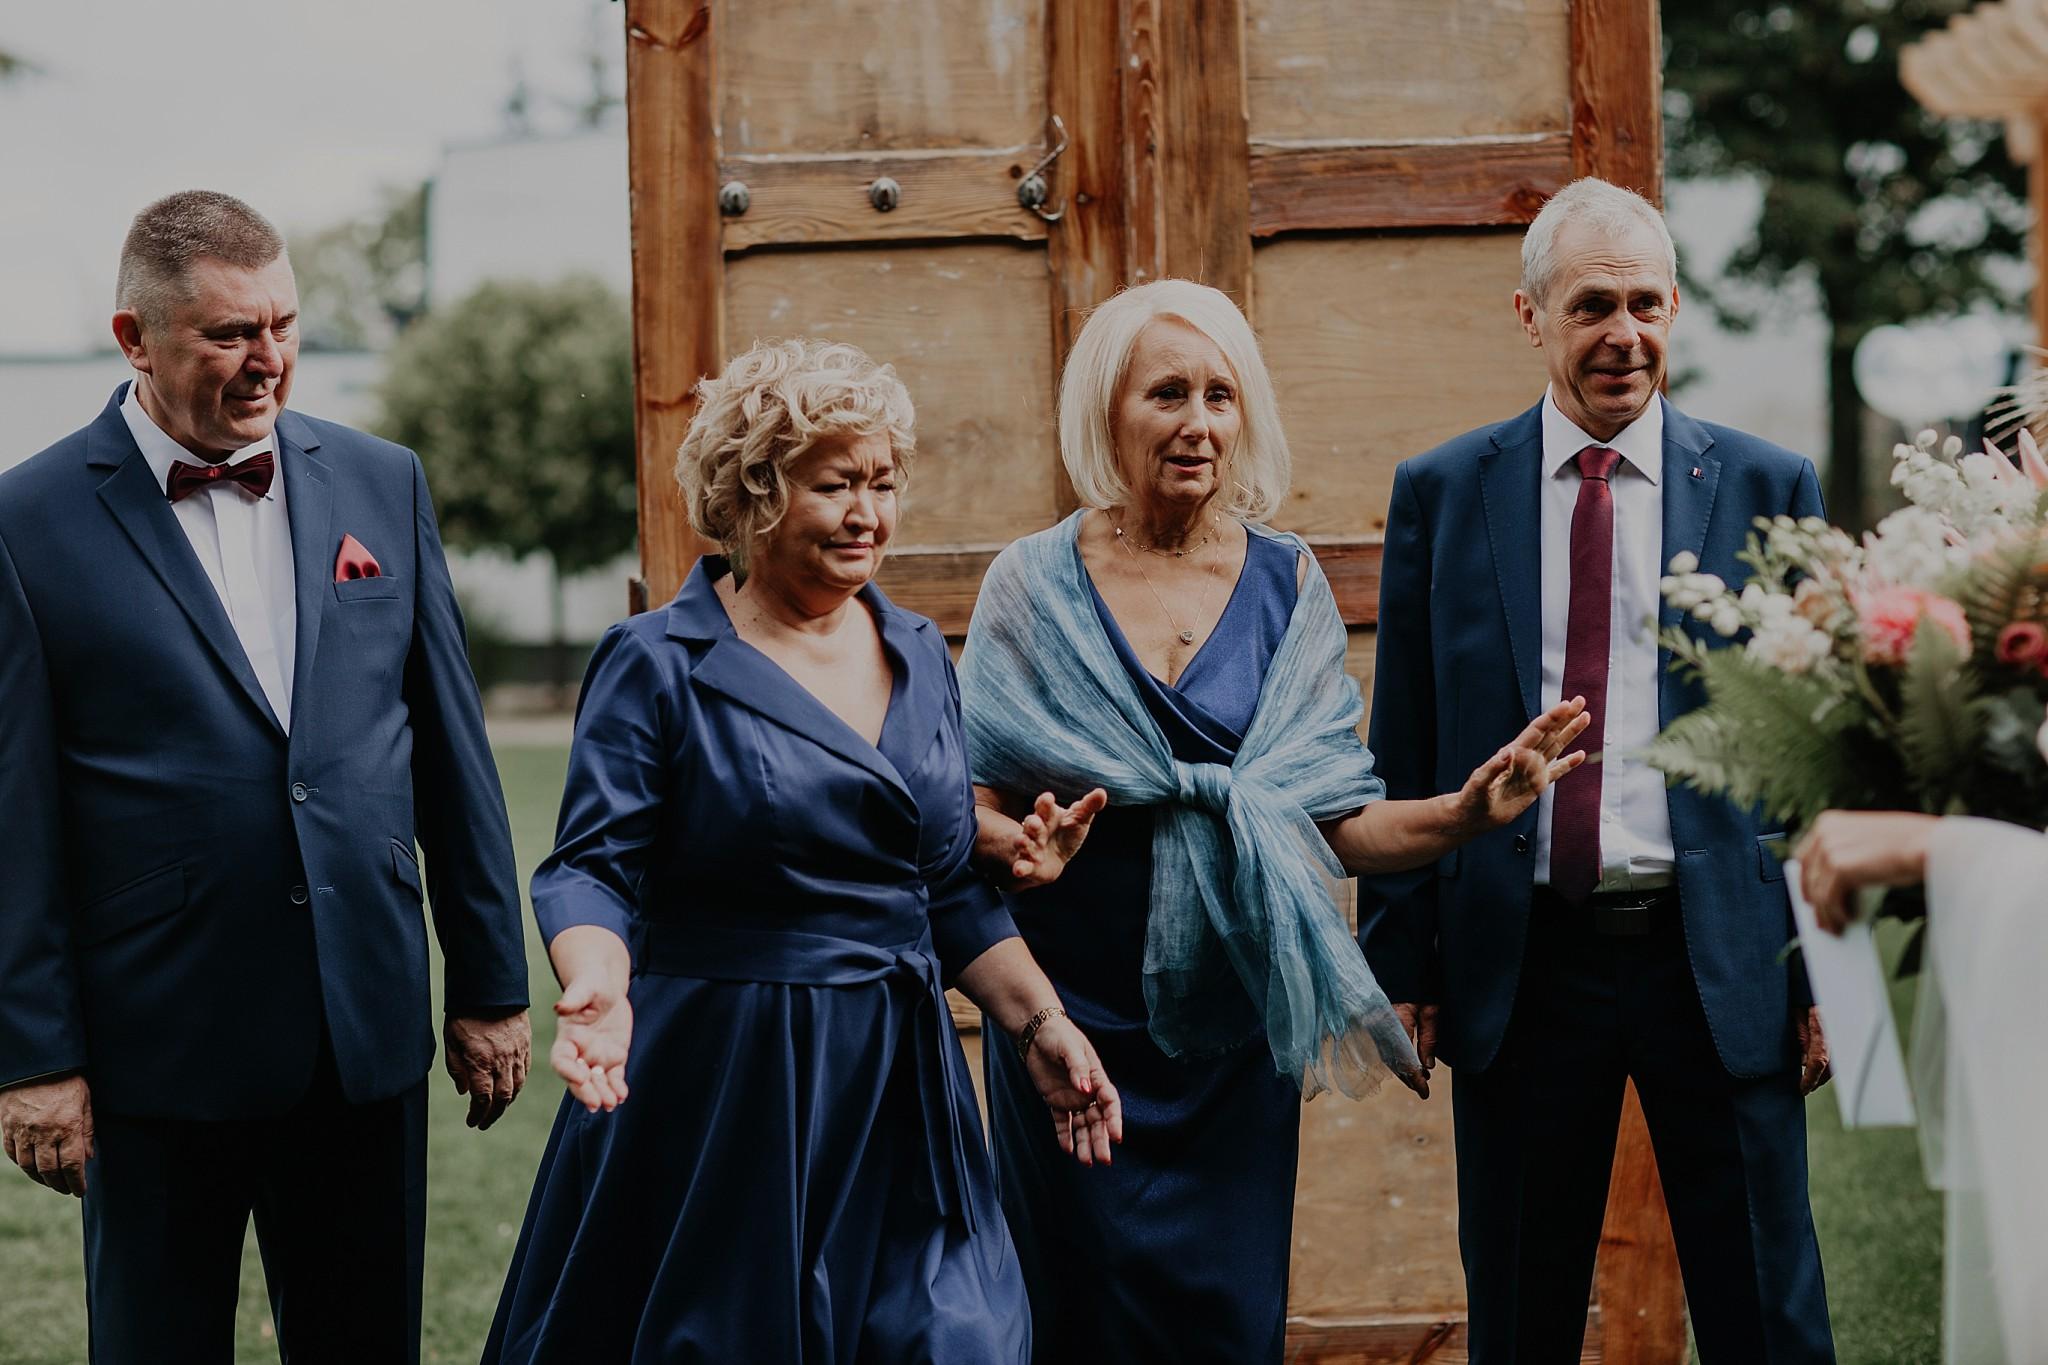 fotograf poznan wesele dobra truskawka piekne wesele pod poznaniem wesele w dobrej truskawce piekna para mloda slub marzen slub koronawirus slub listopad wesele koronawirus 095